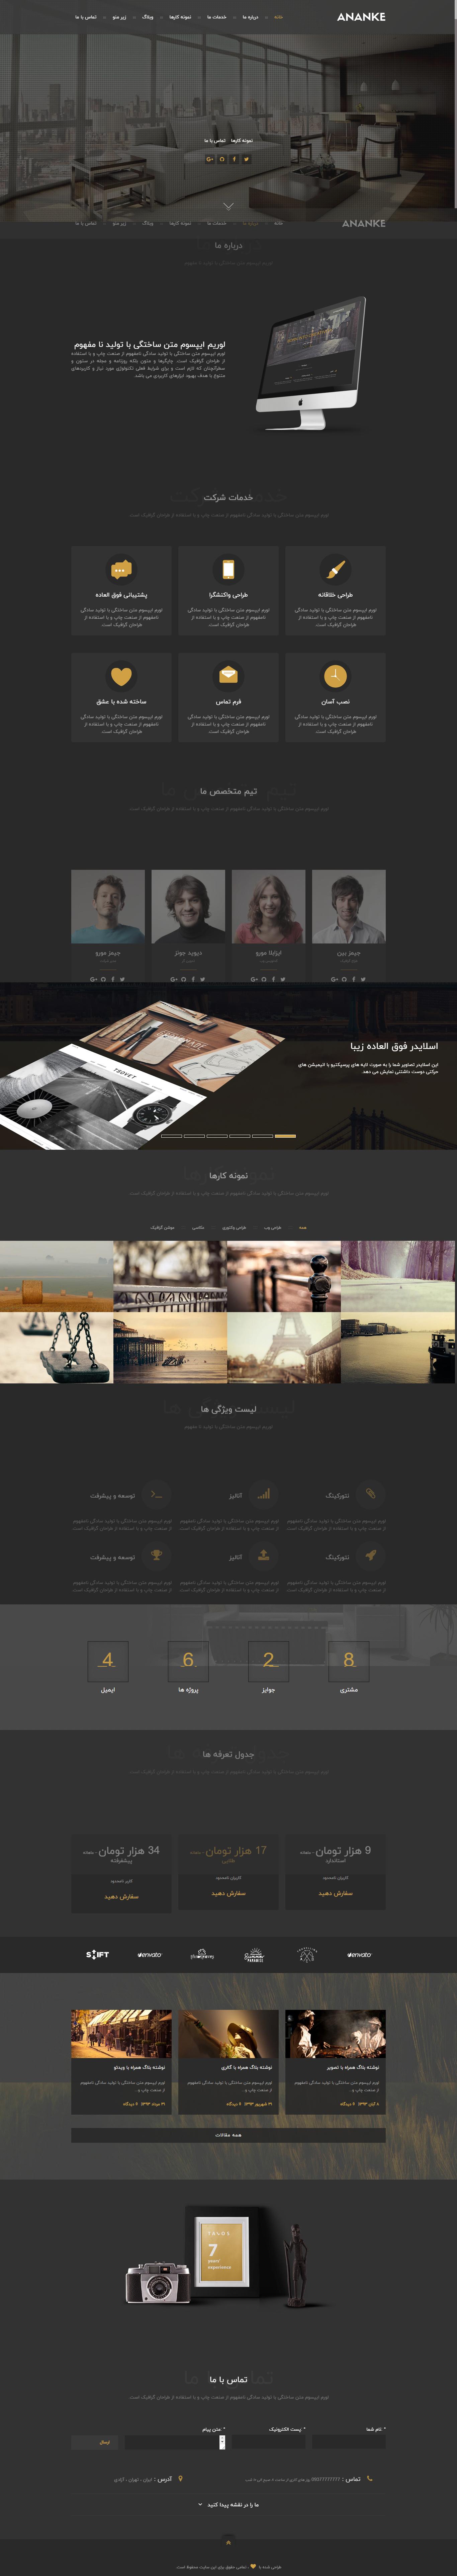 پوسته وردپرس تک صفحه ای آنانک | Ananke One Page Parallax